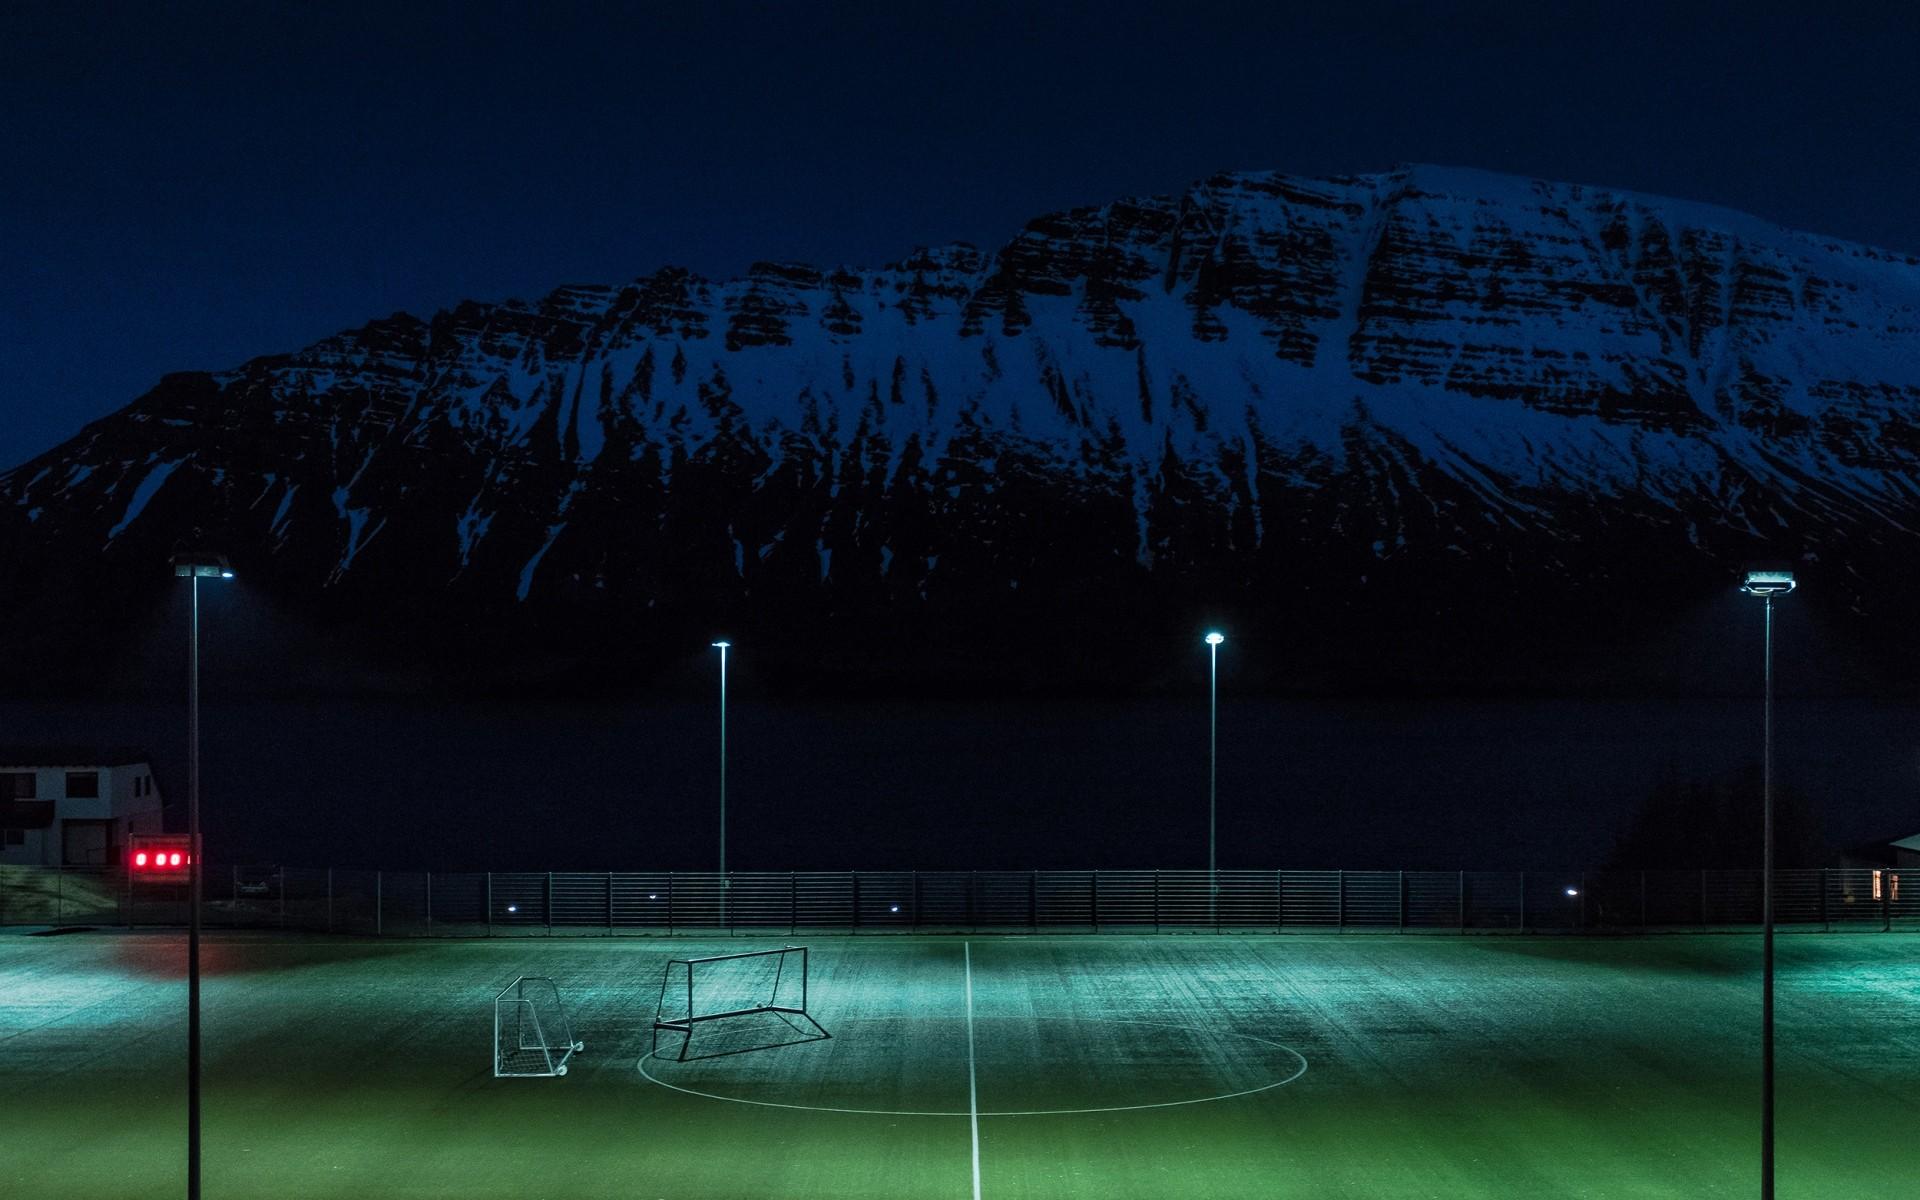 Wallpaper football field, night, lawn, playground